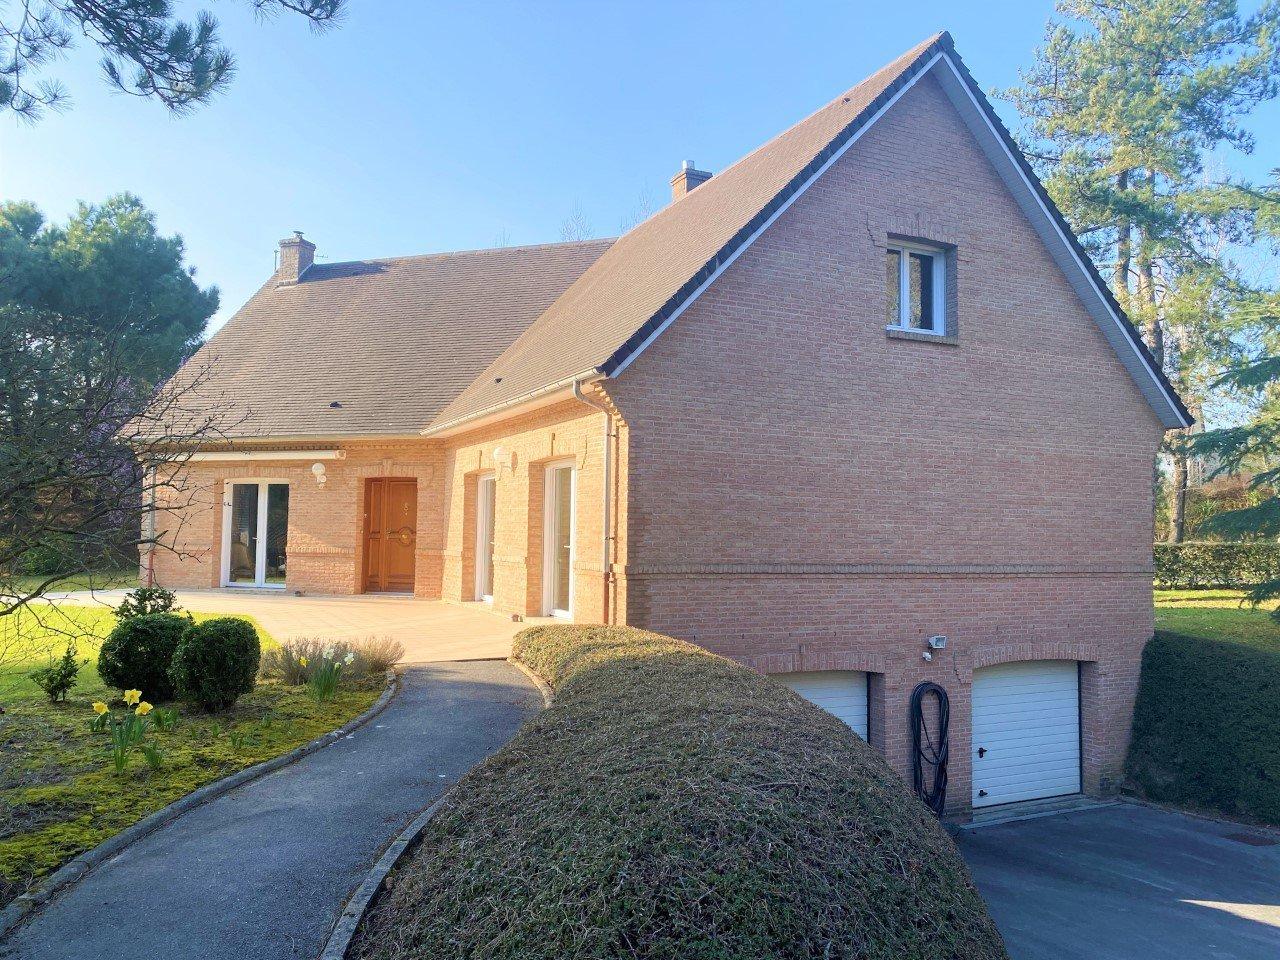 VILLA A VENDRE - HARDELOT PLAGE - 220 m2 - 748800 €